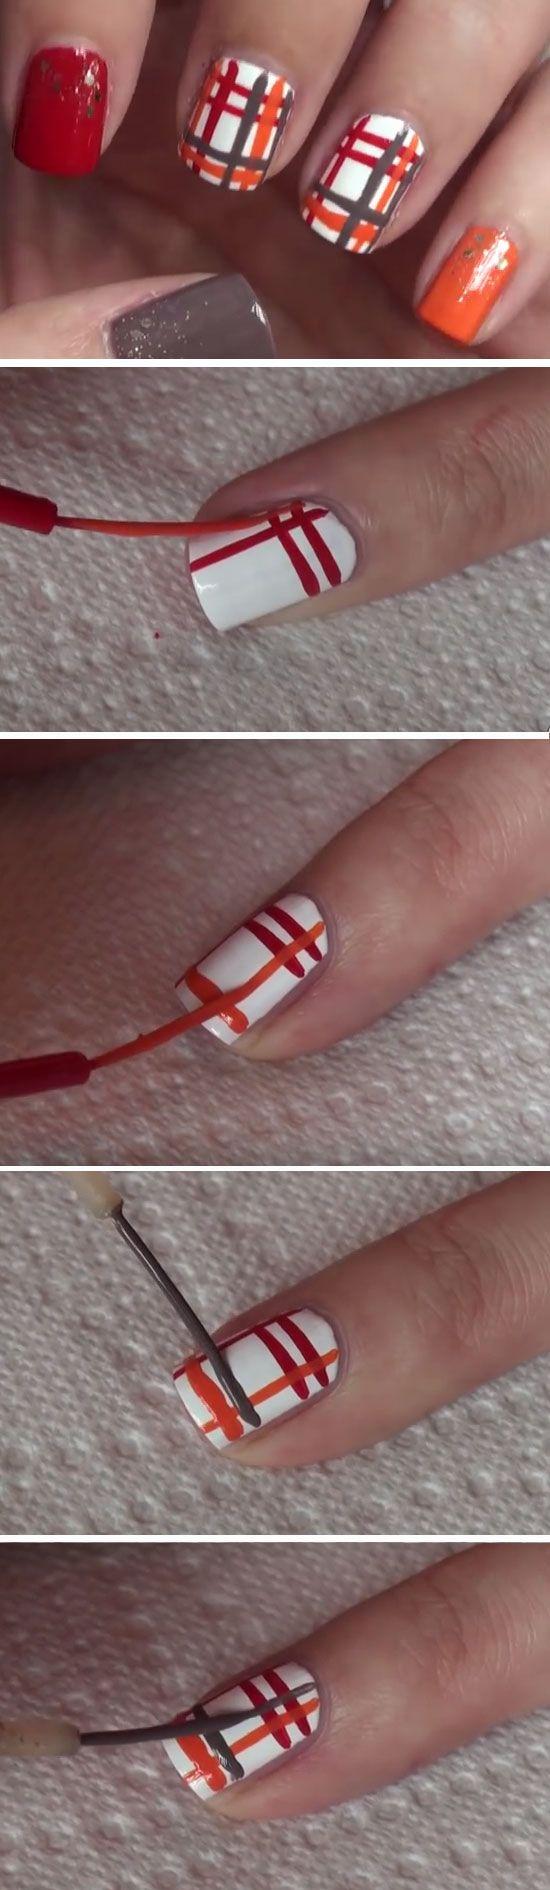 22 Easy Fall Nail Designs for Short Nails | Nagellack kunst ...